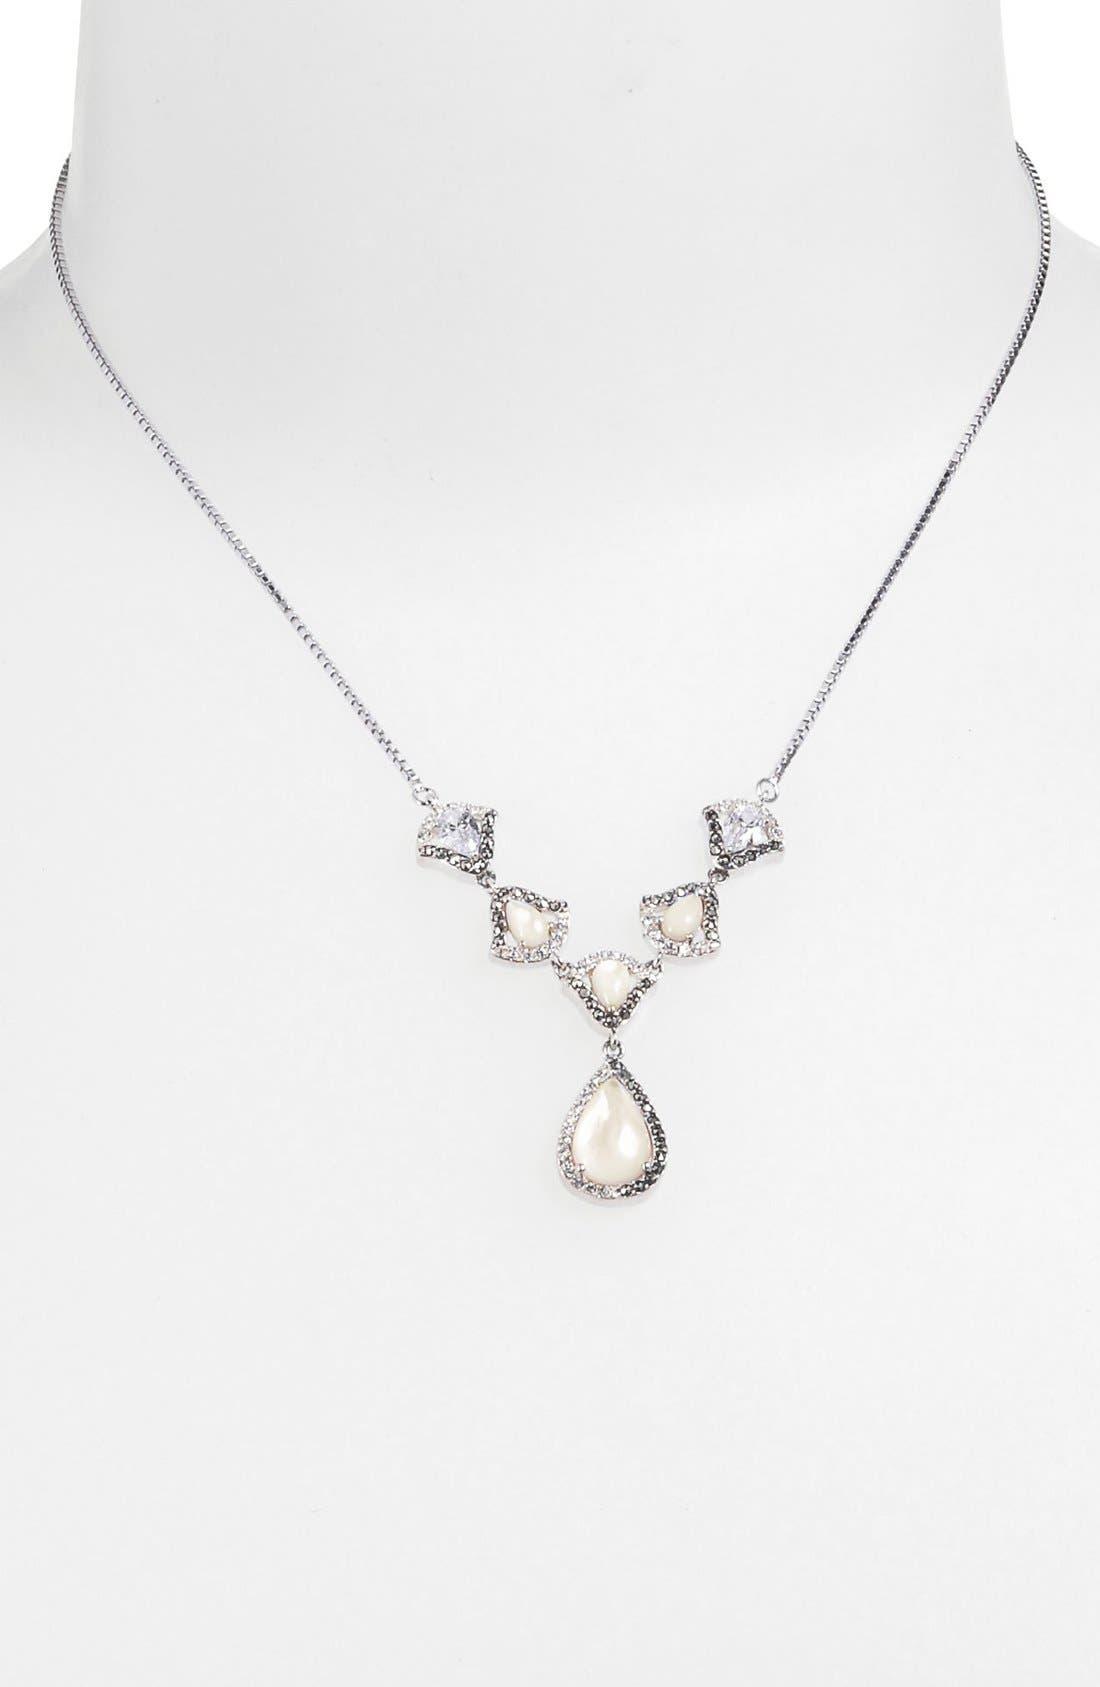 Main Image - Judith Jack 'Amore' Pendant Necklace